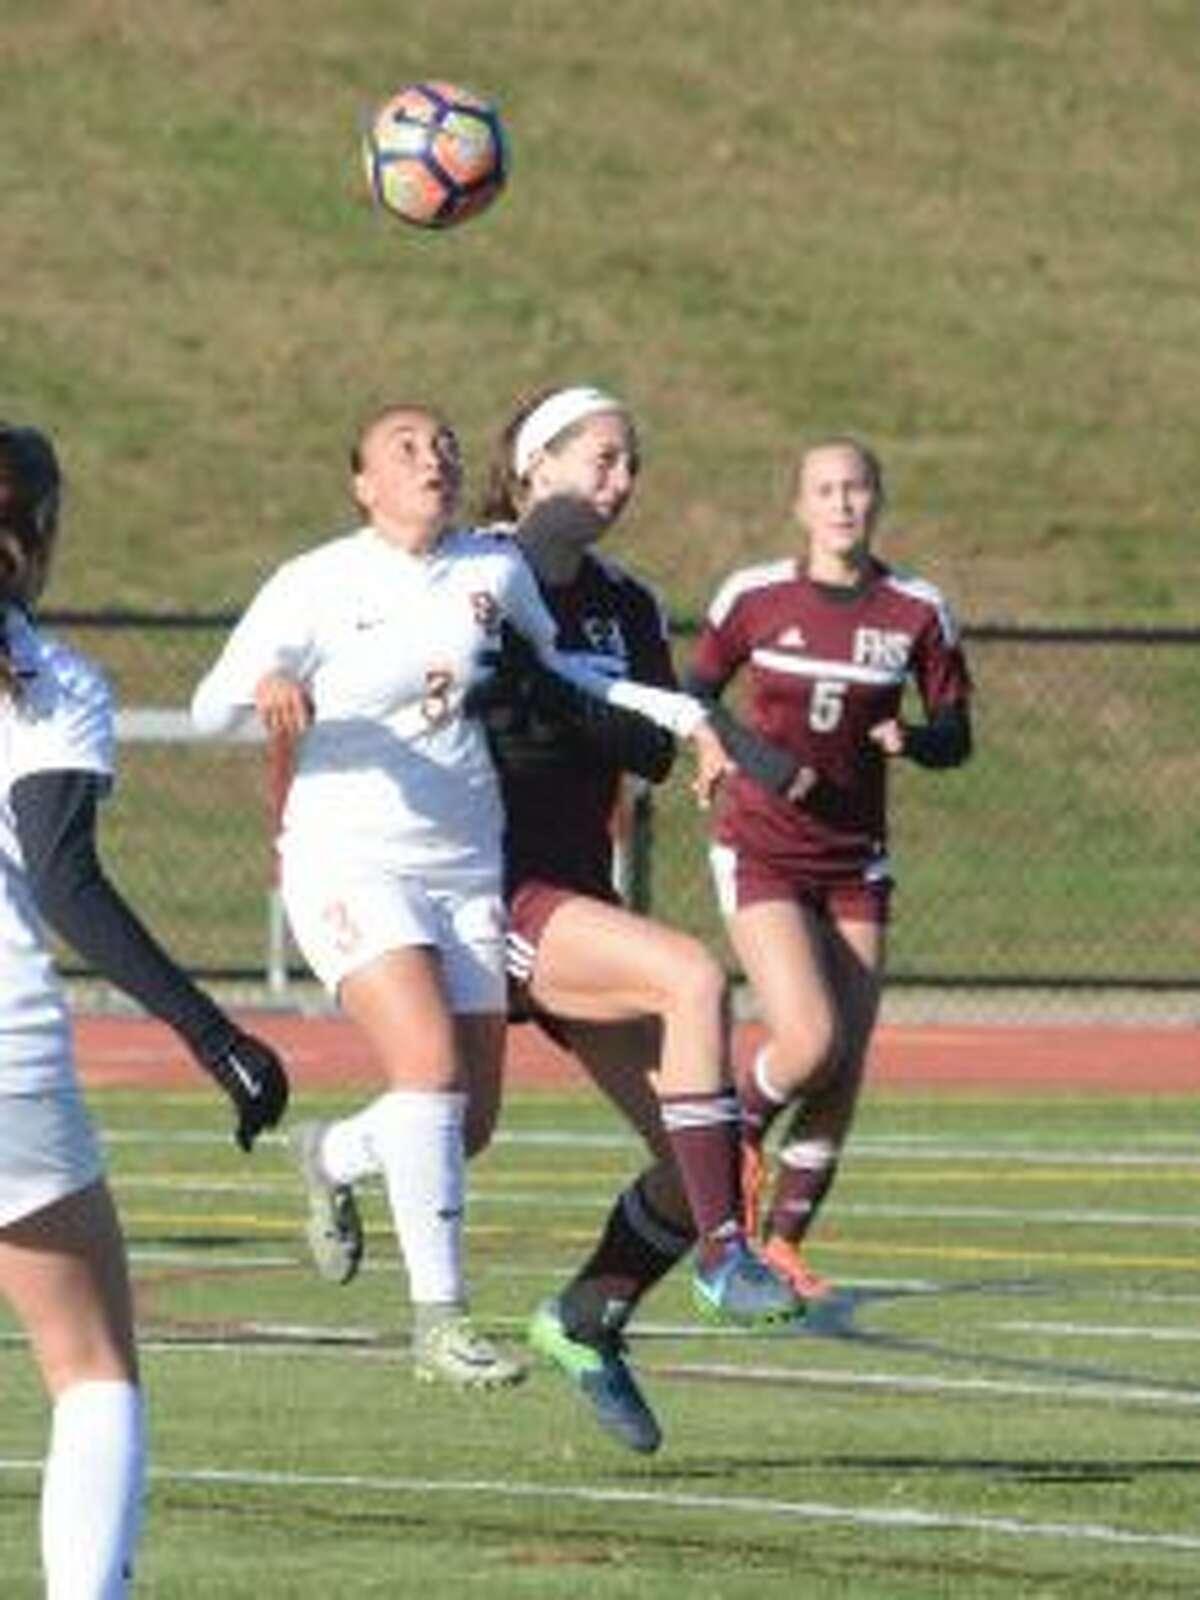 Andriana Cabral wins a ball in the air versus Farmington.